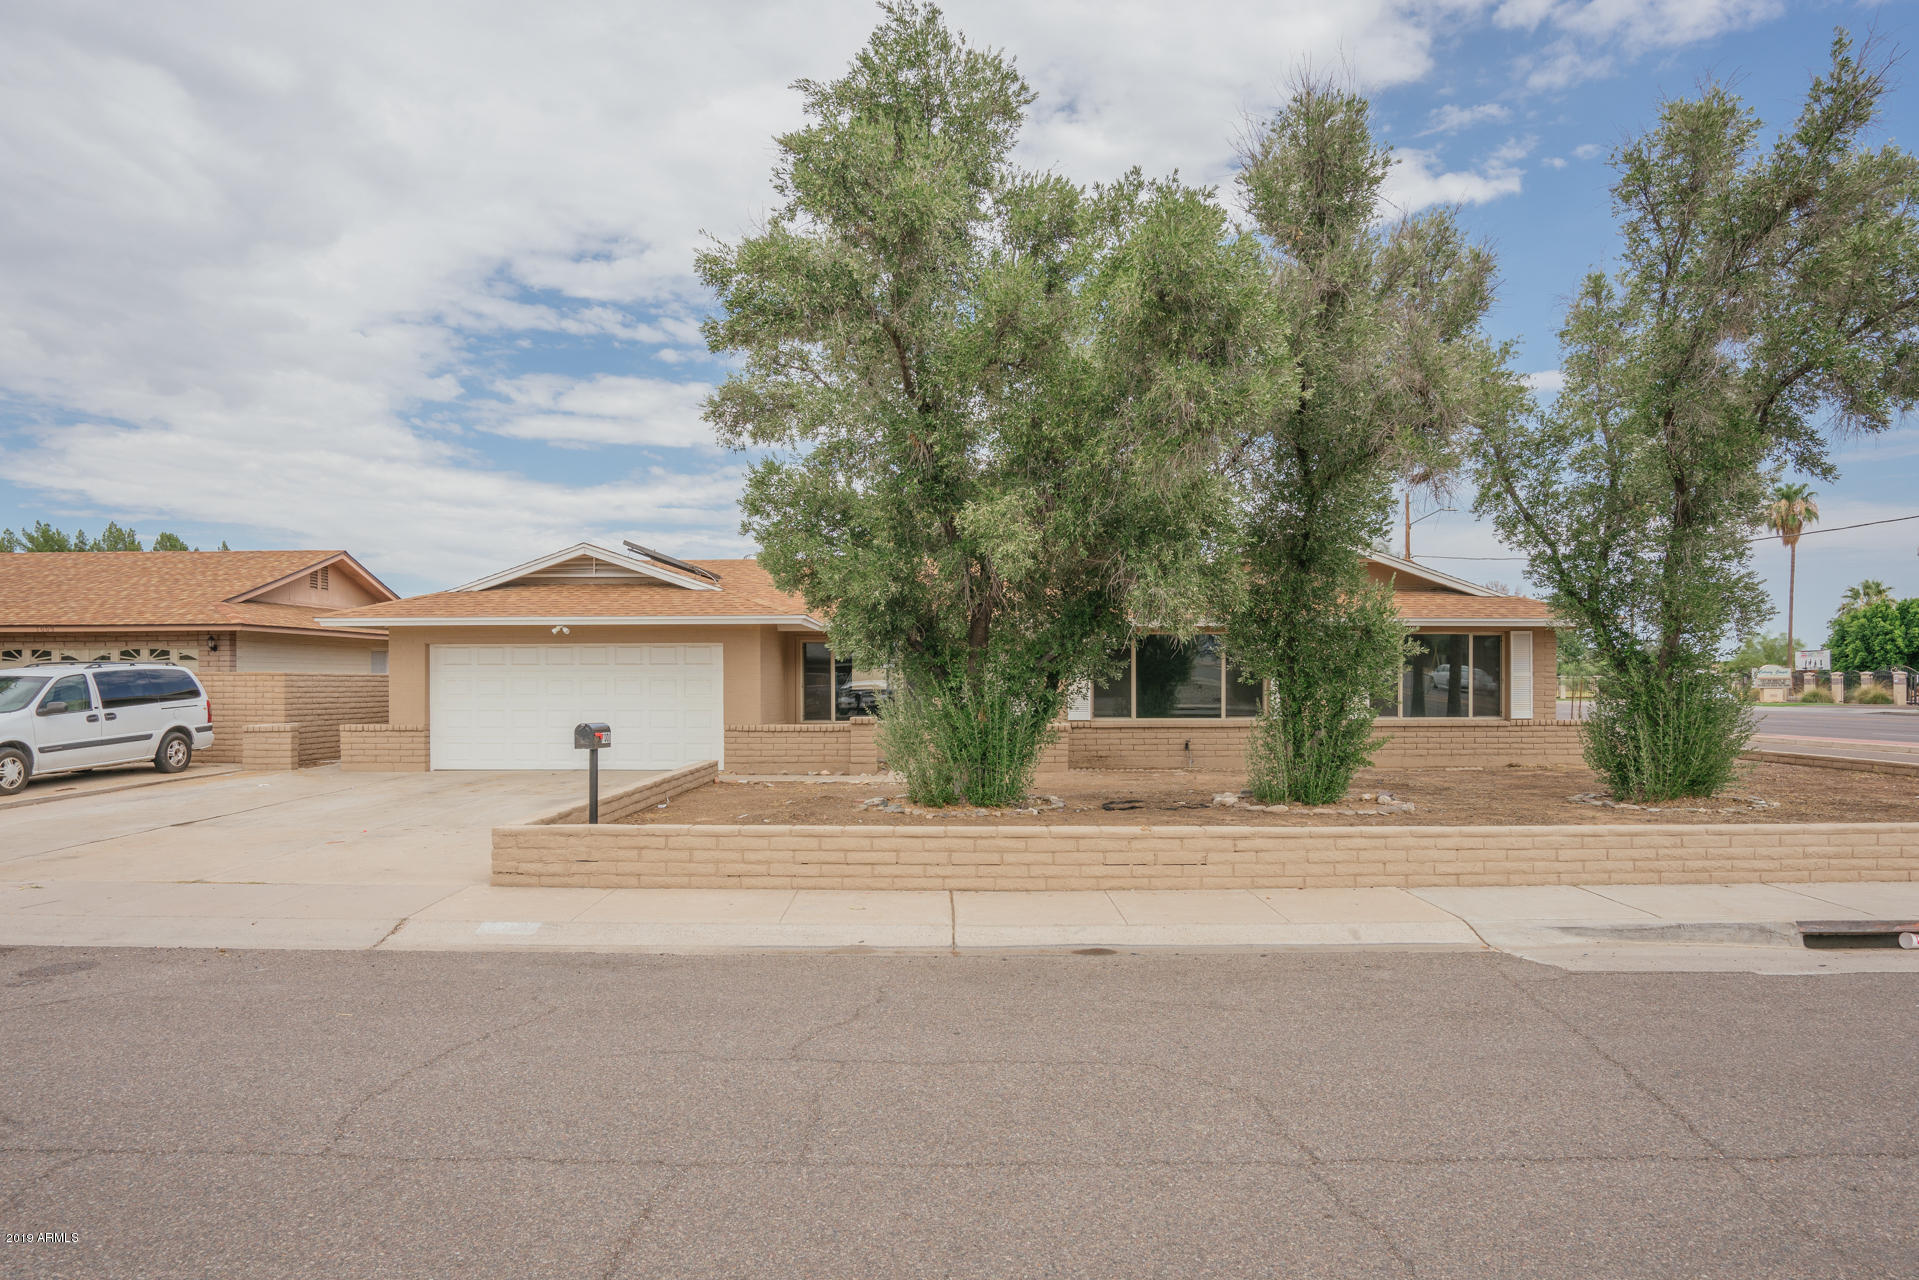 Photo of 7001 N 29TH Avenue, Phoenix, AZ 85051